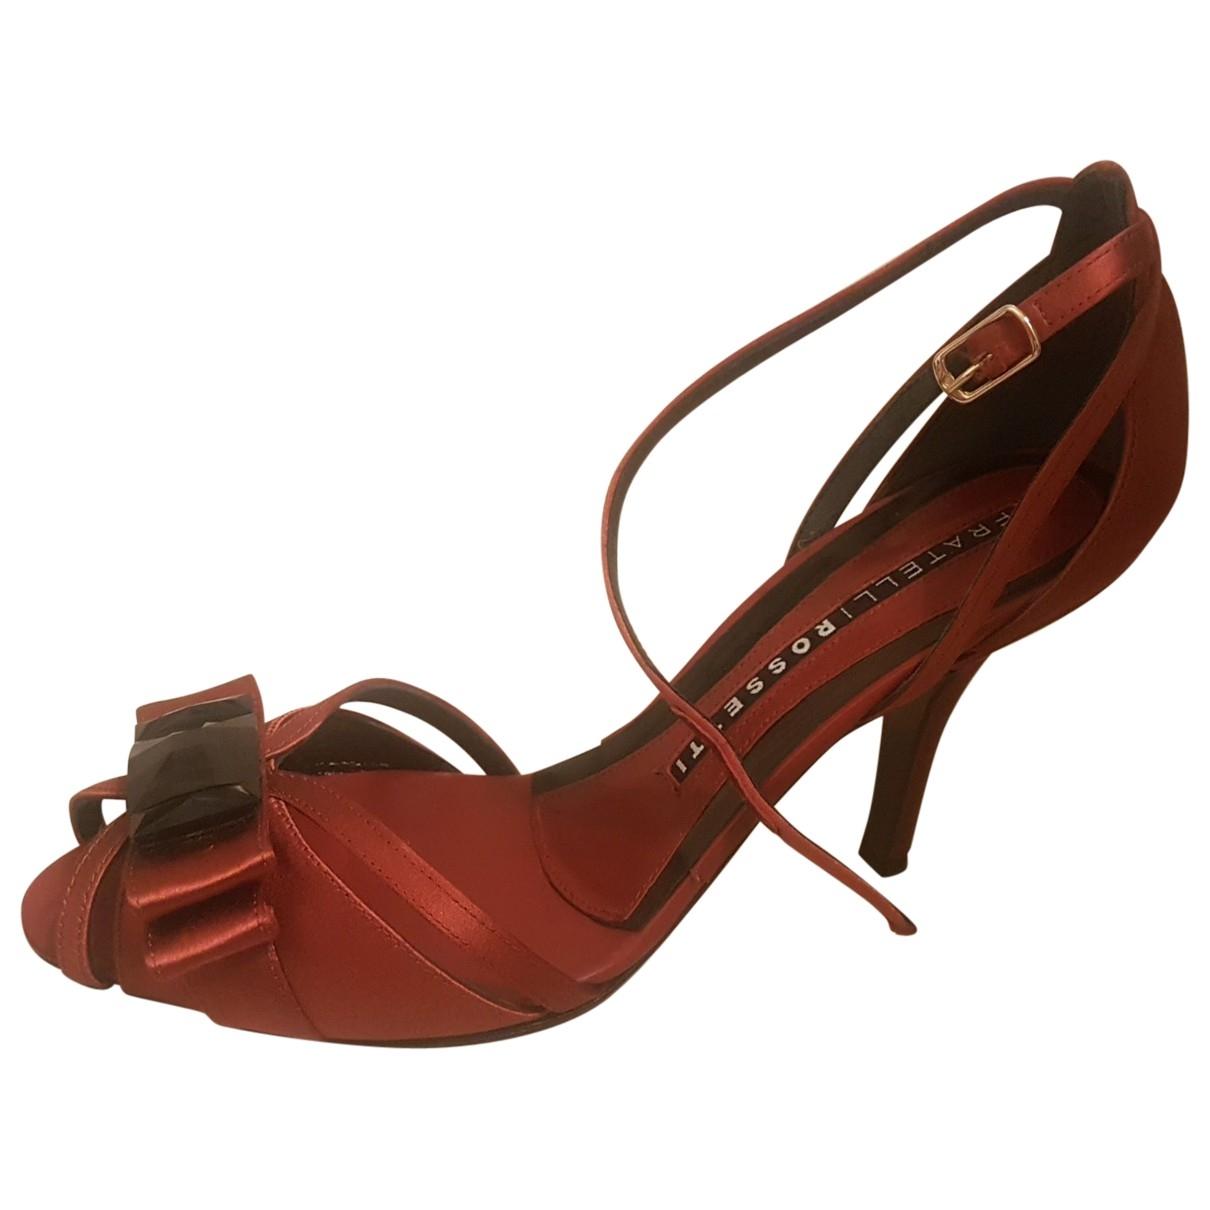 Sandalias de Terciopelo Fratelli Rossetti